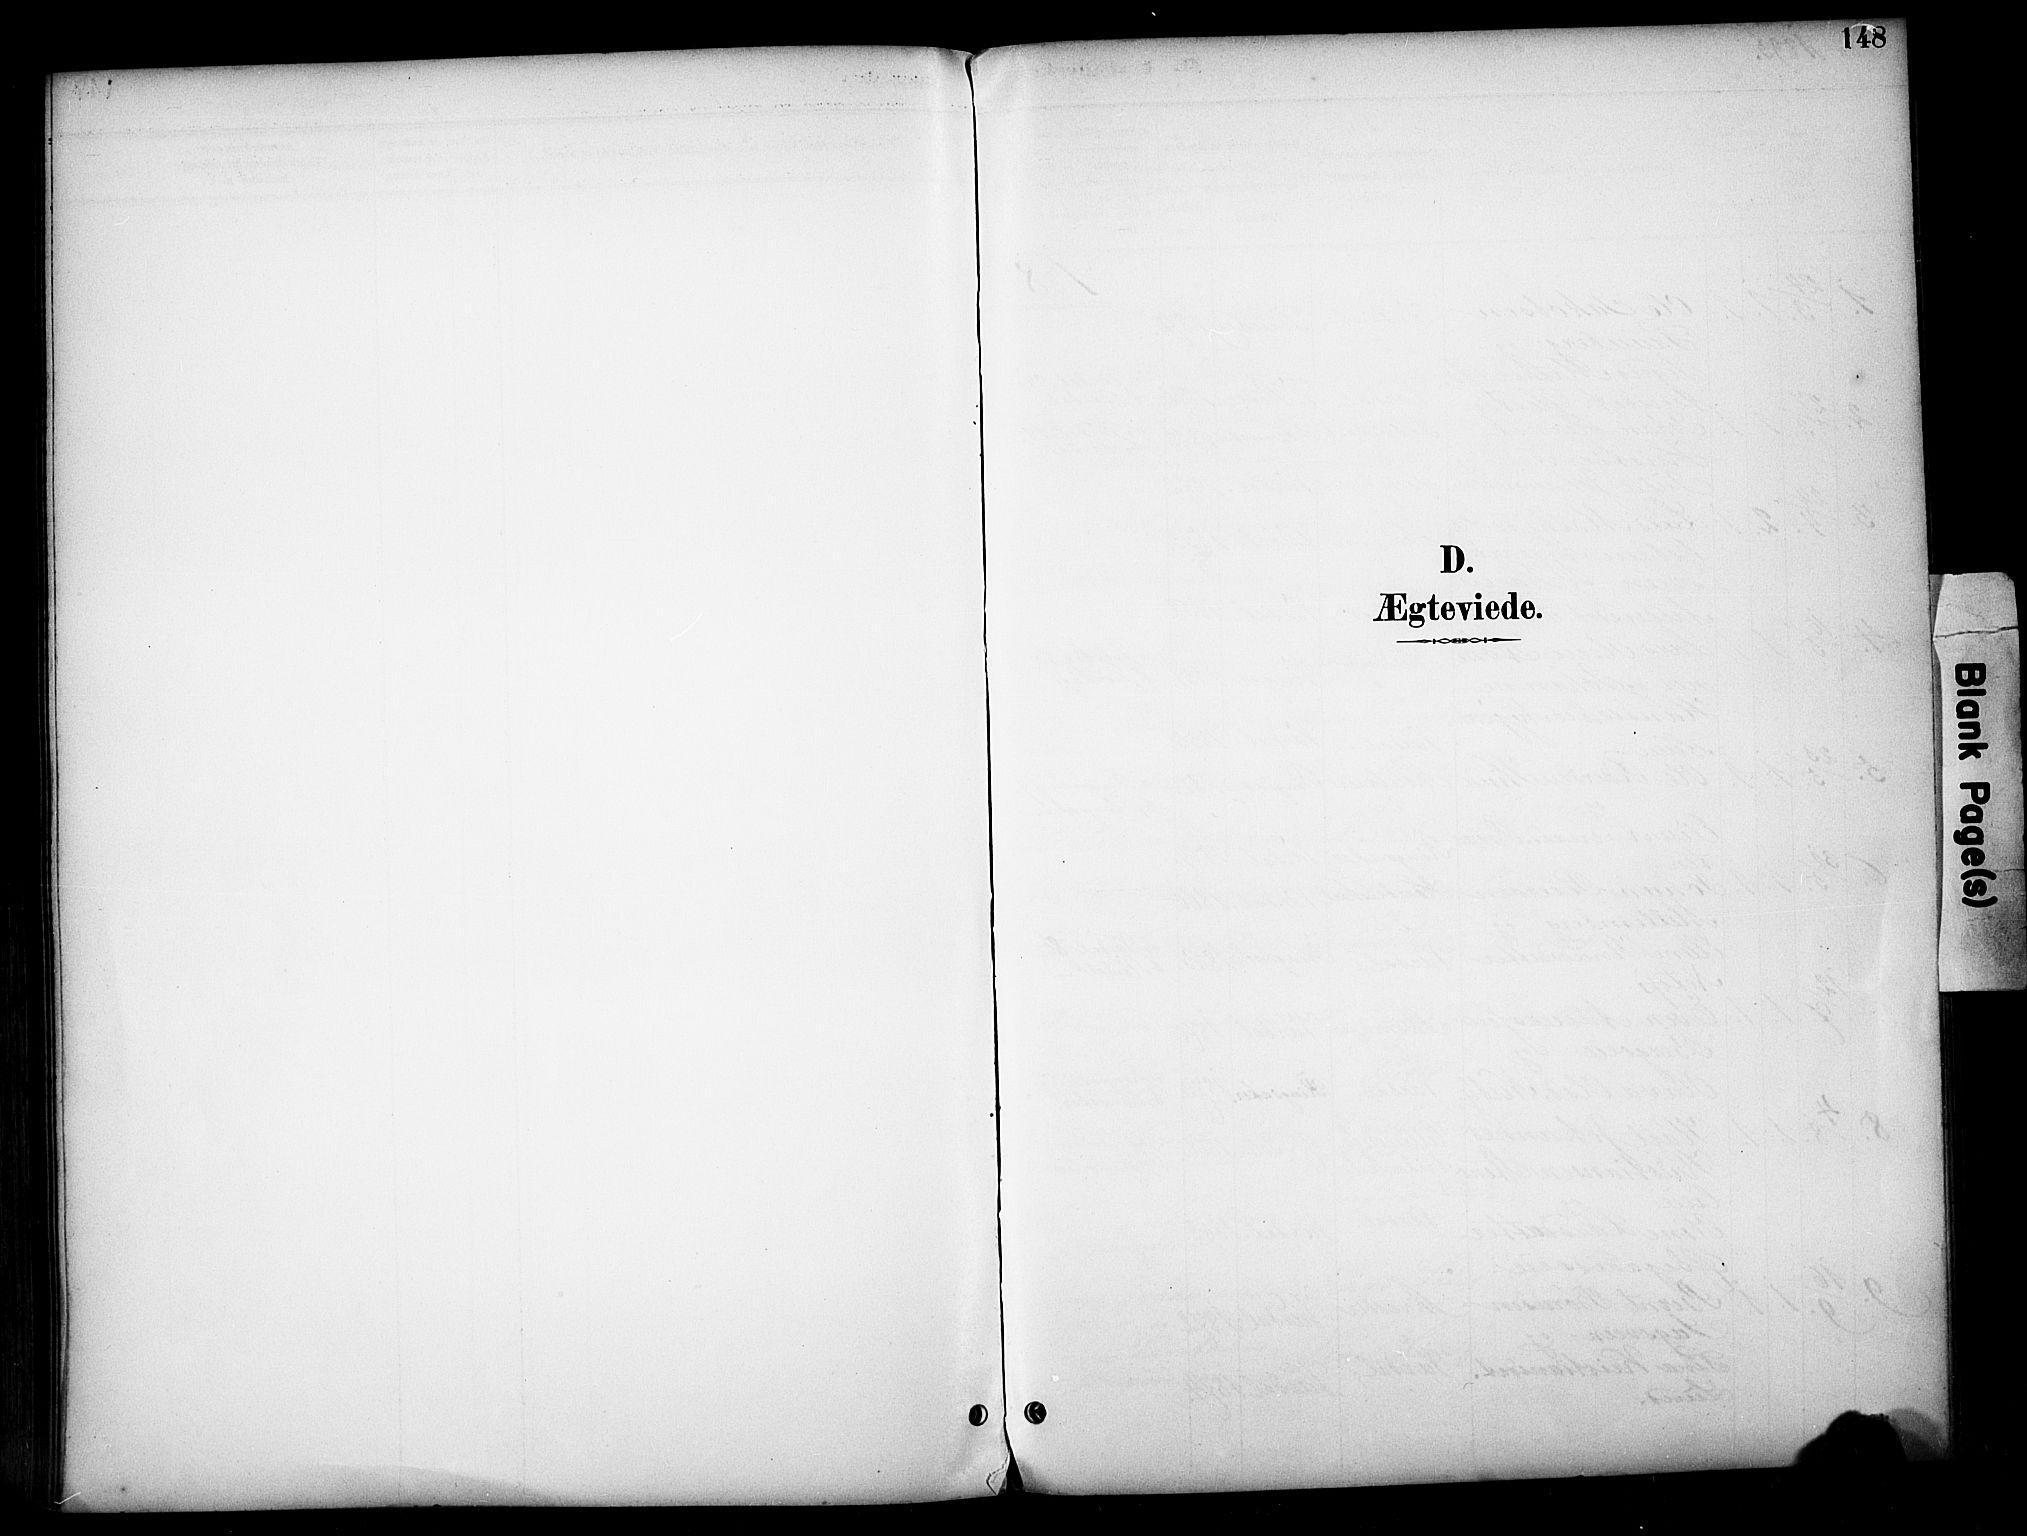 SAH, Vardal prestekontor, H/Ha/Haa/L0012: Ministerialbok nr. 12, 1893-1904, s. 148